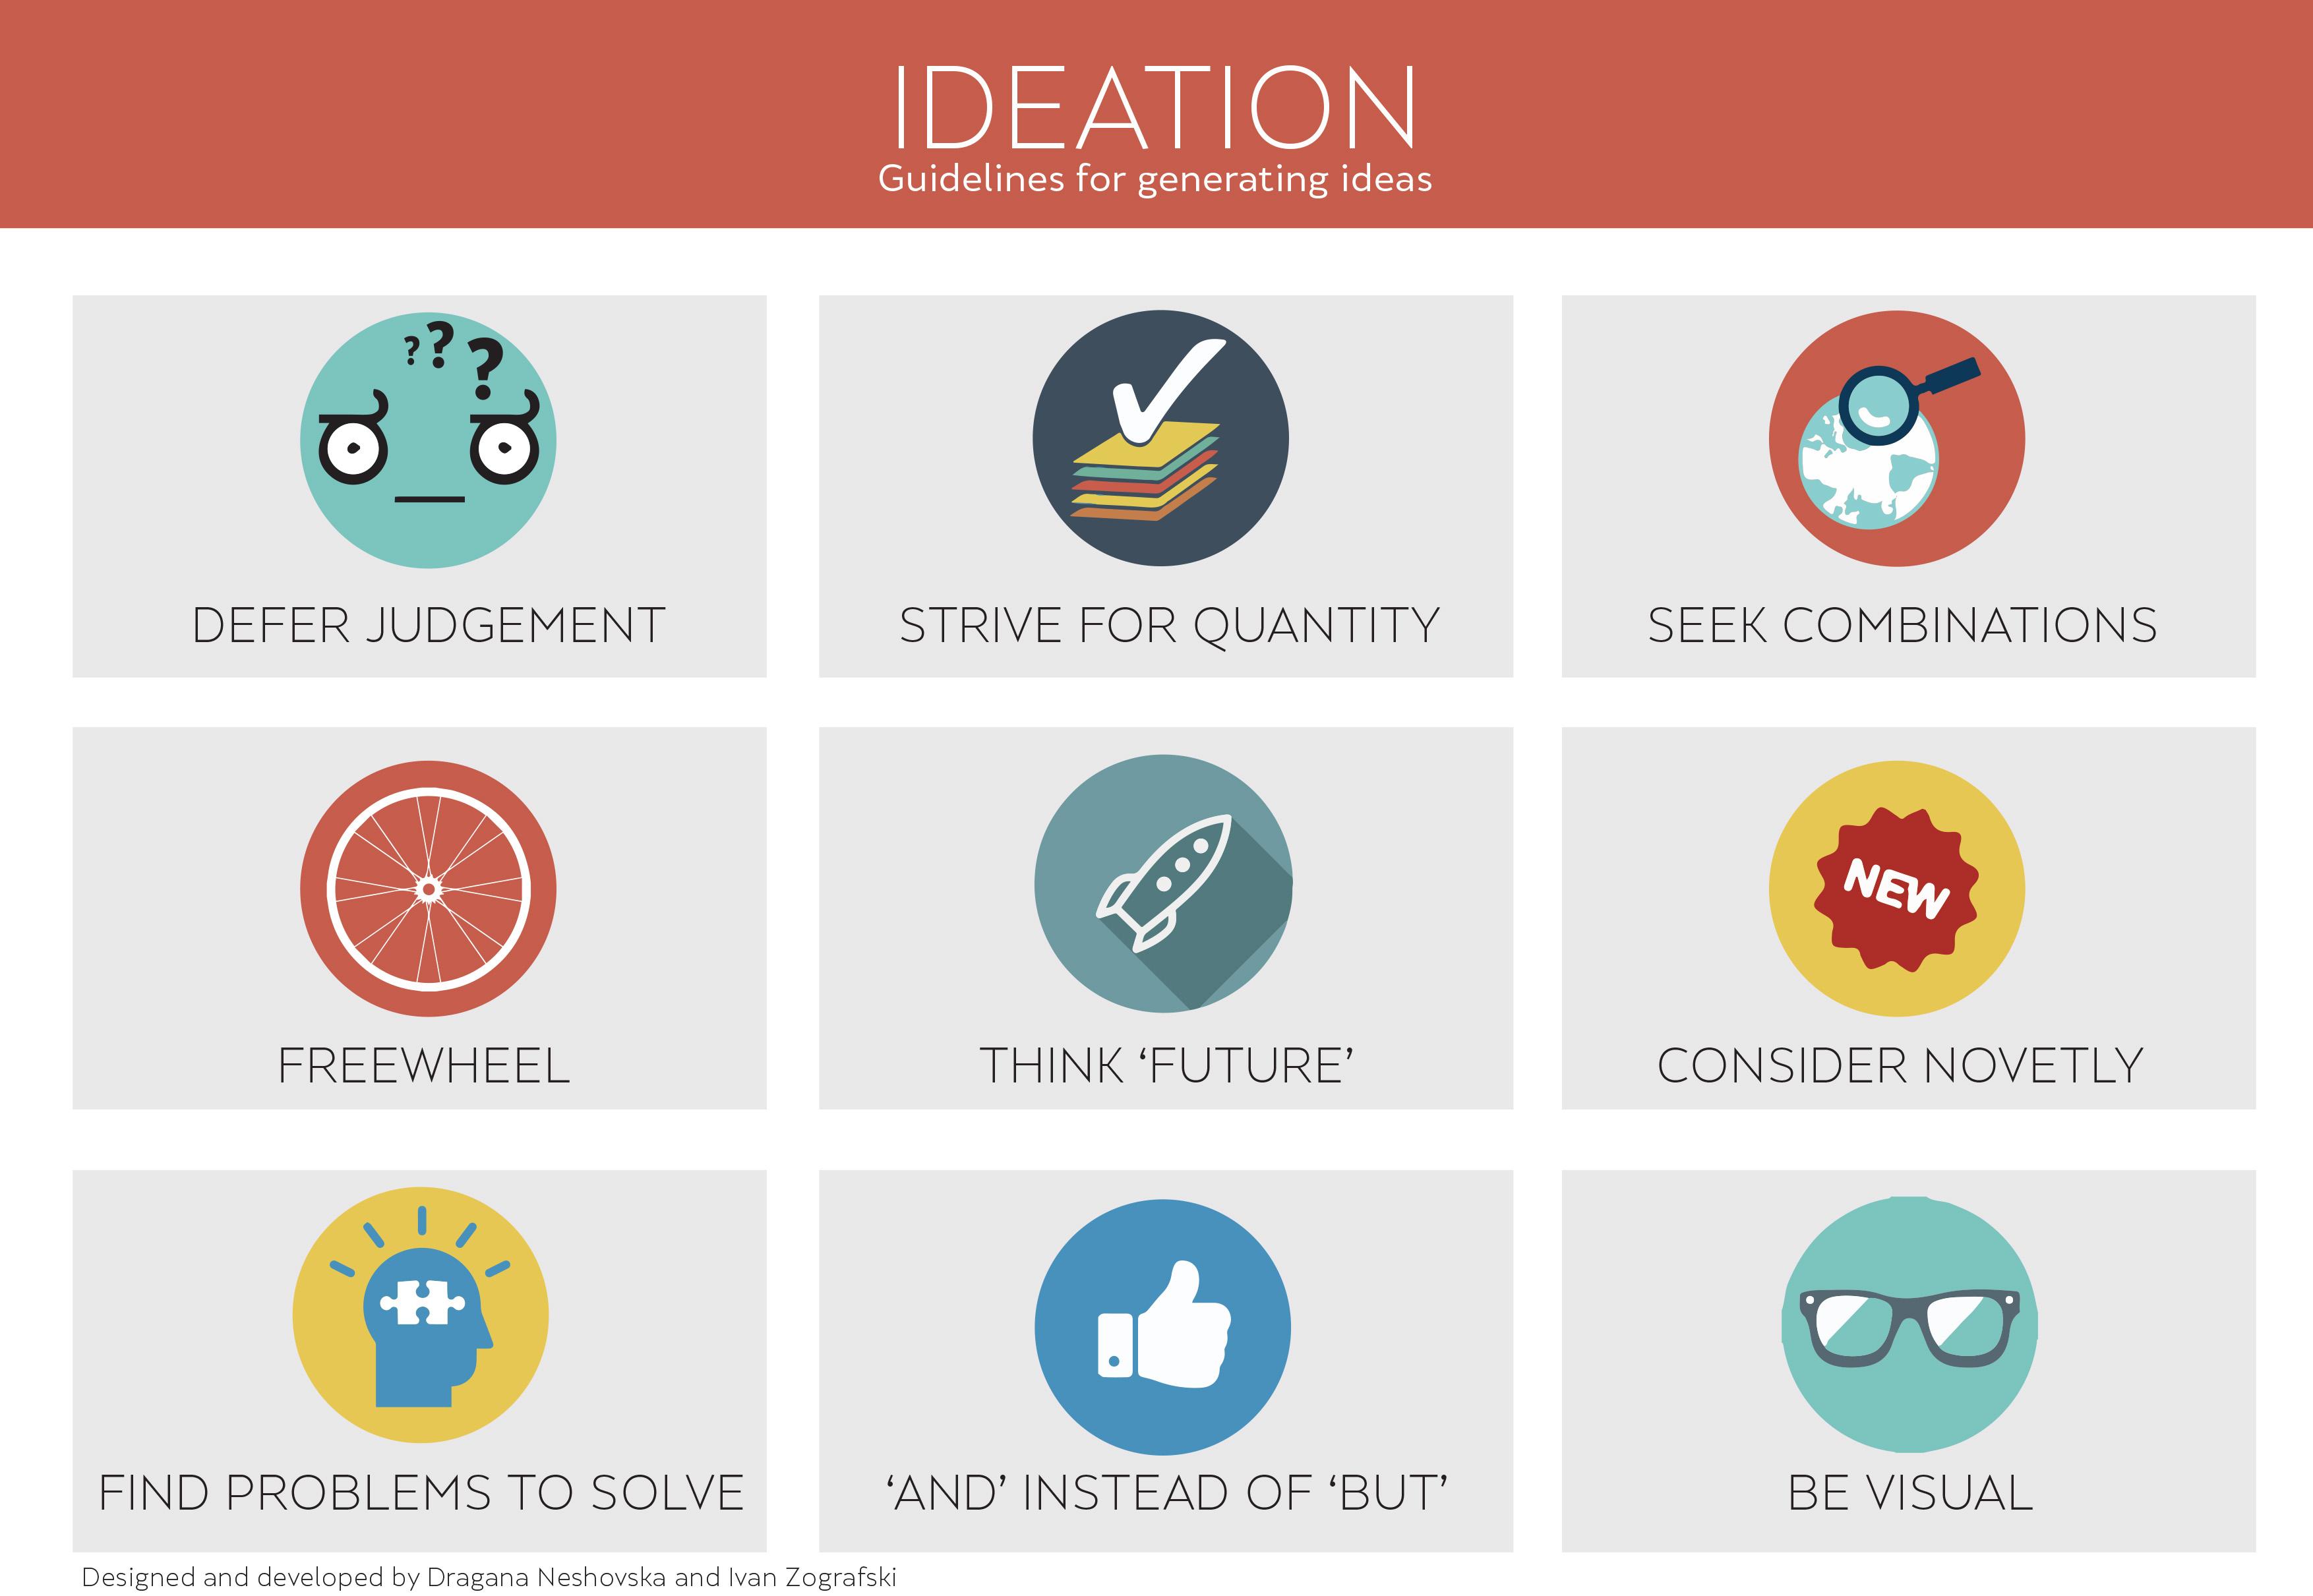 Ideation